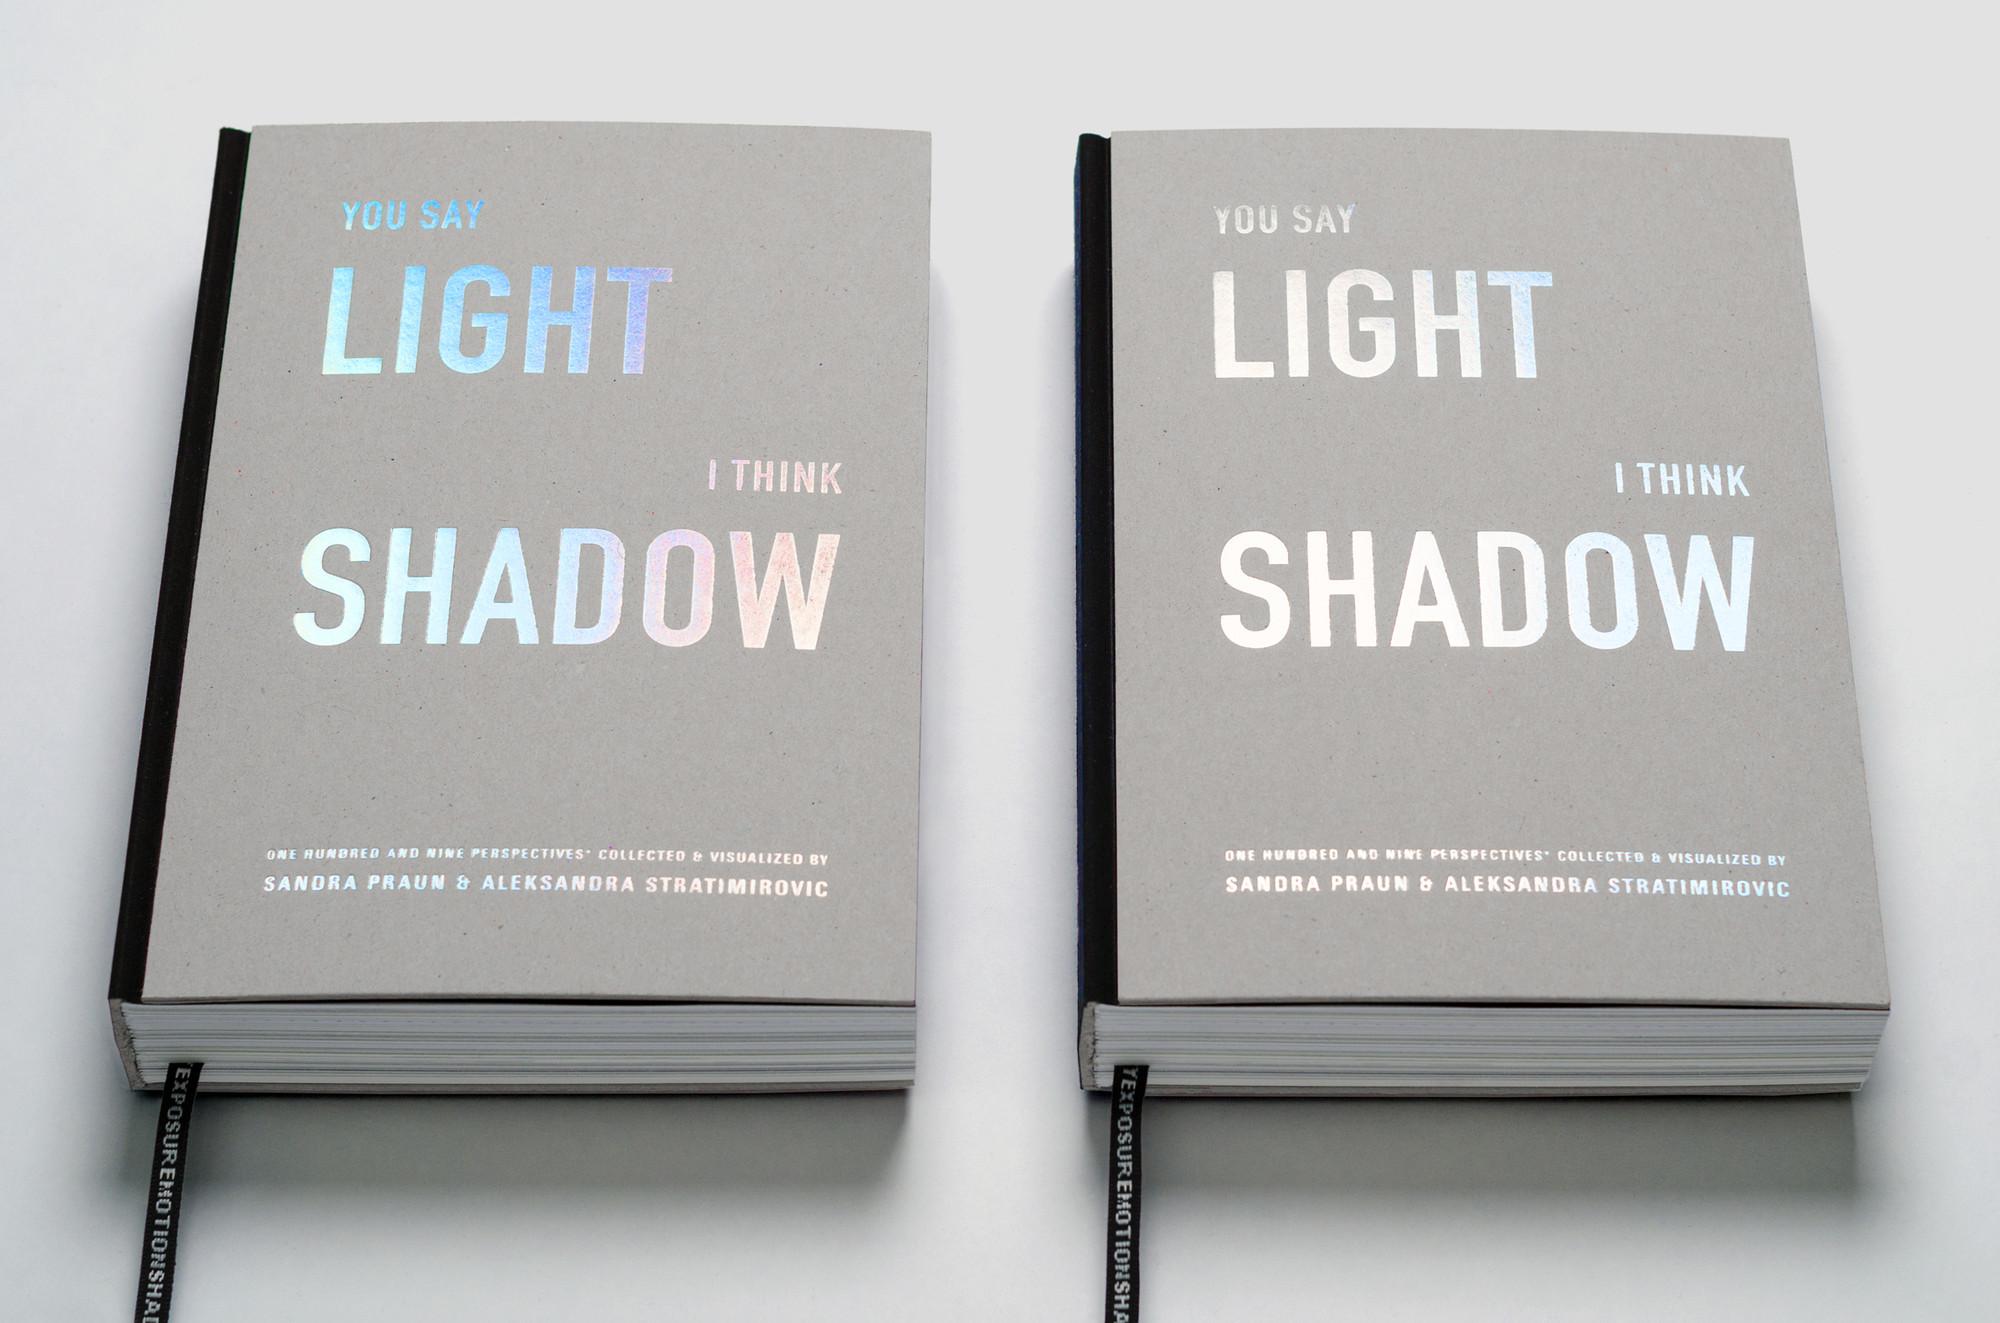 Book: You Say Light - I Think Shadow. Authors: Sandra Praun and Aleksandra Stratimirovic. Image © Sandra Praun and Aleksandra Stratimirovic